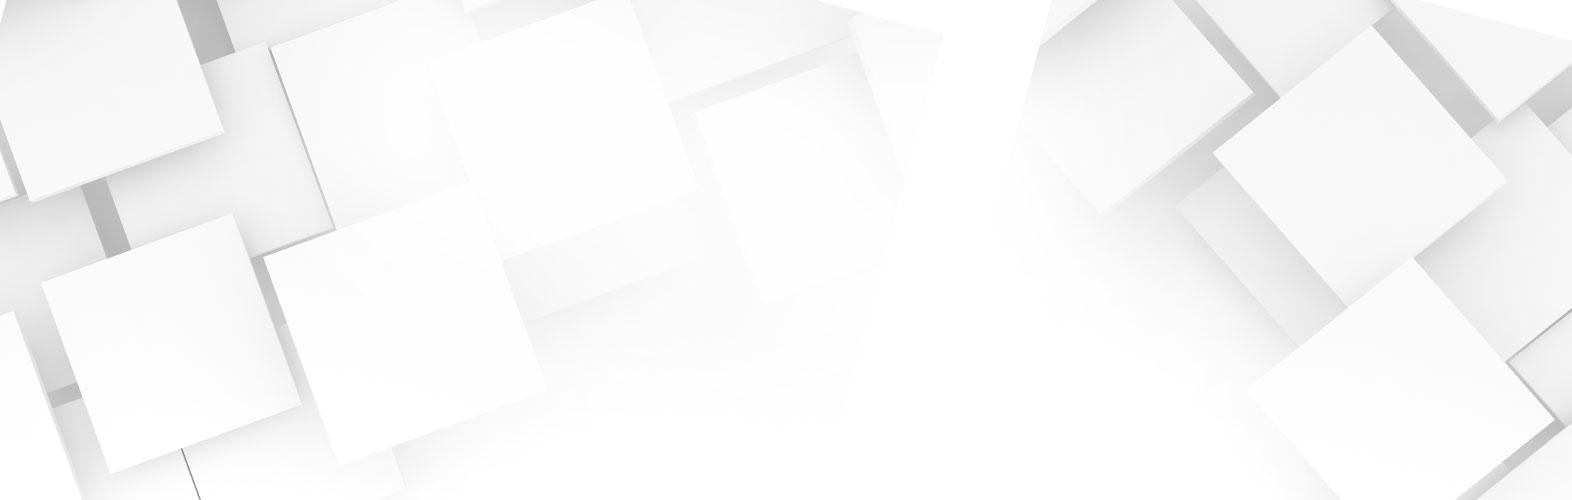 PromoPageRotator_Background